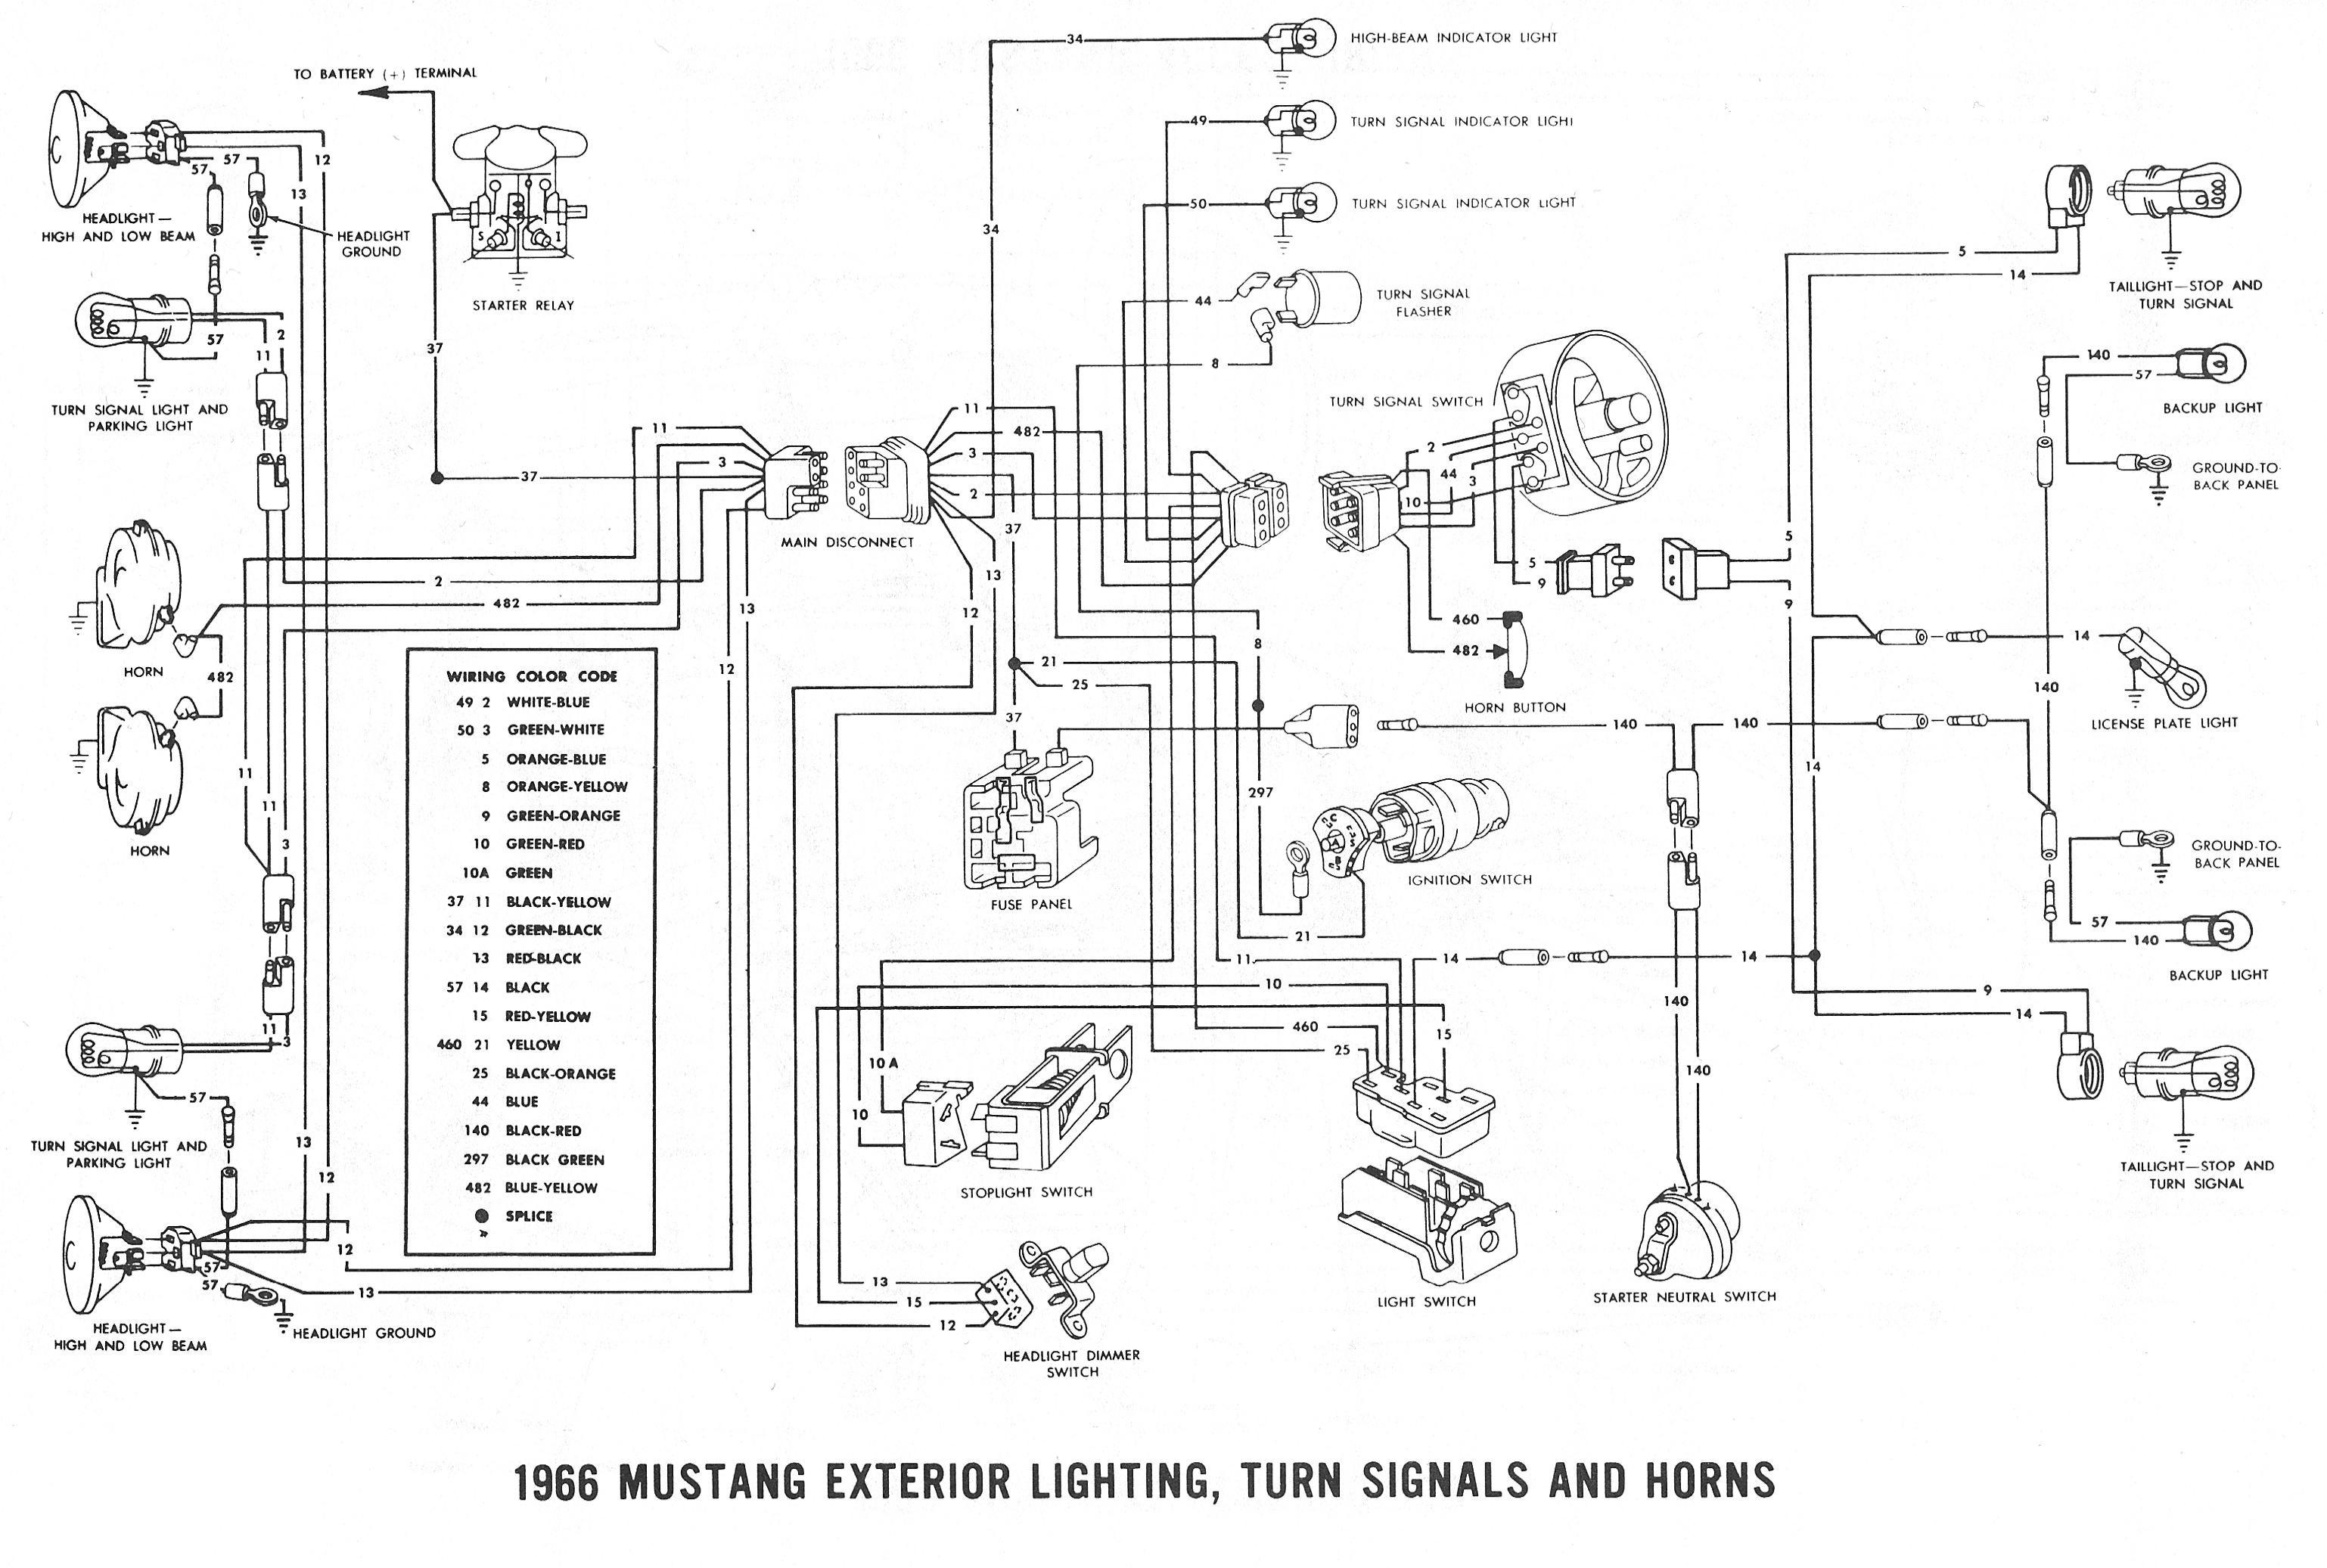 1965 Mustang Wiring Diagram 1965 ford Wiring Diagram